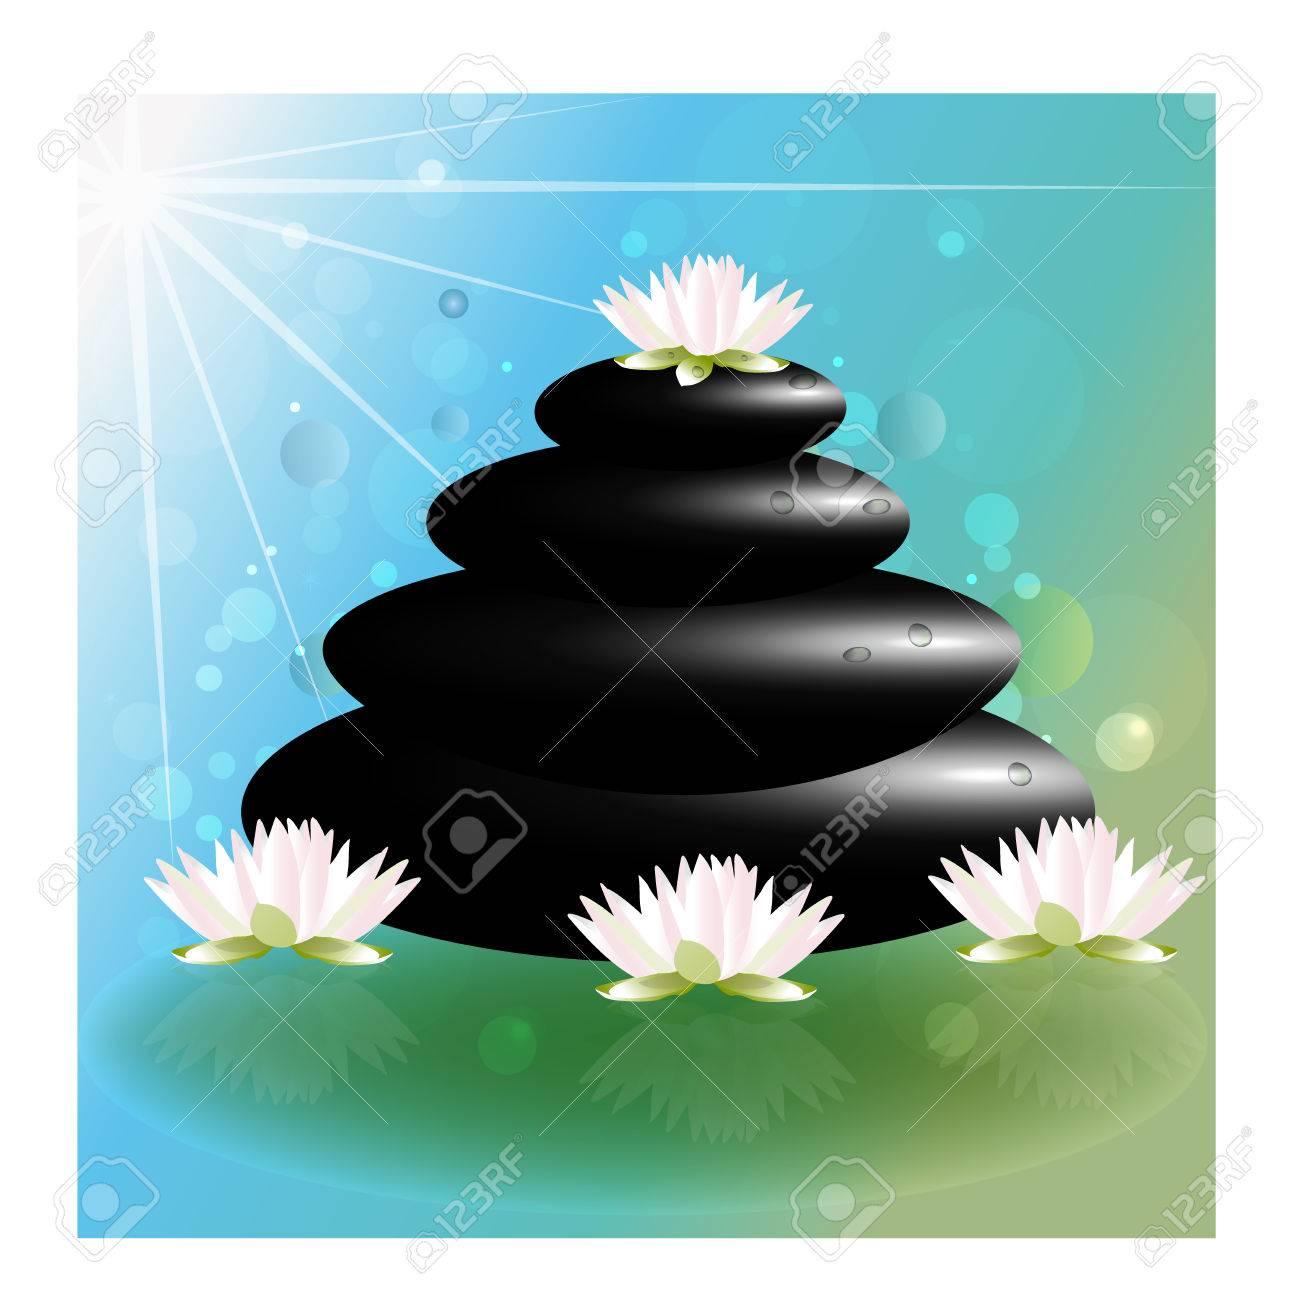 Spa Massage Lotus Flowers Zen Stones Vector Background Royalty Free